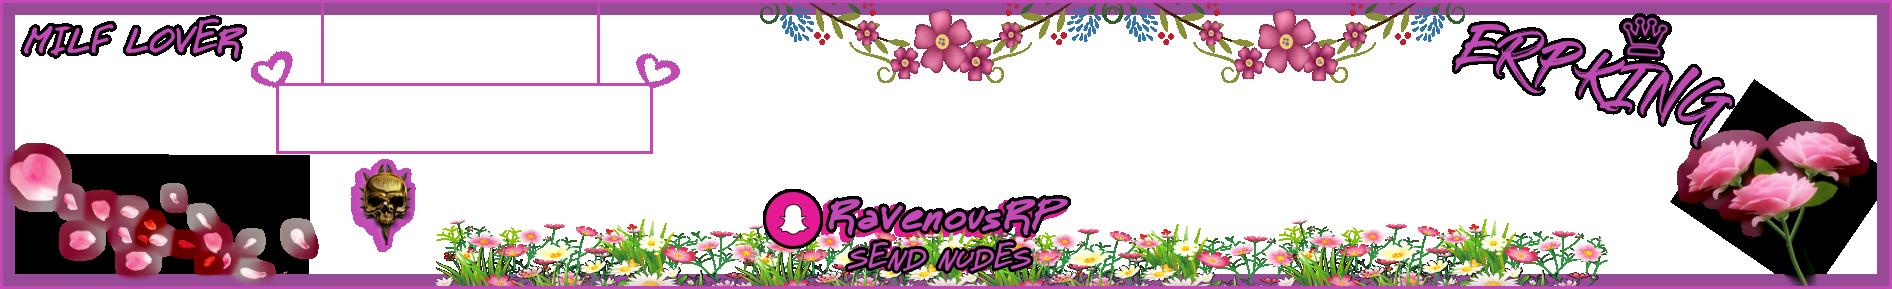 1621943683_RavenousRP2.png.736633011fd1319121cfcb81695d3ef8.png